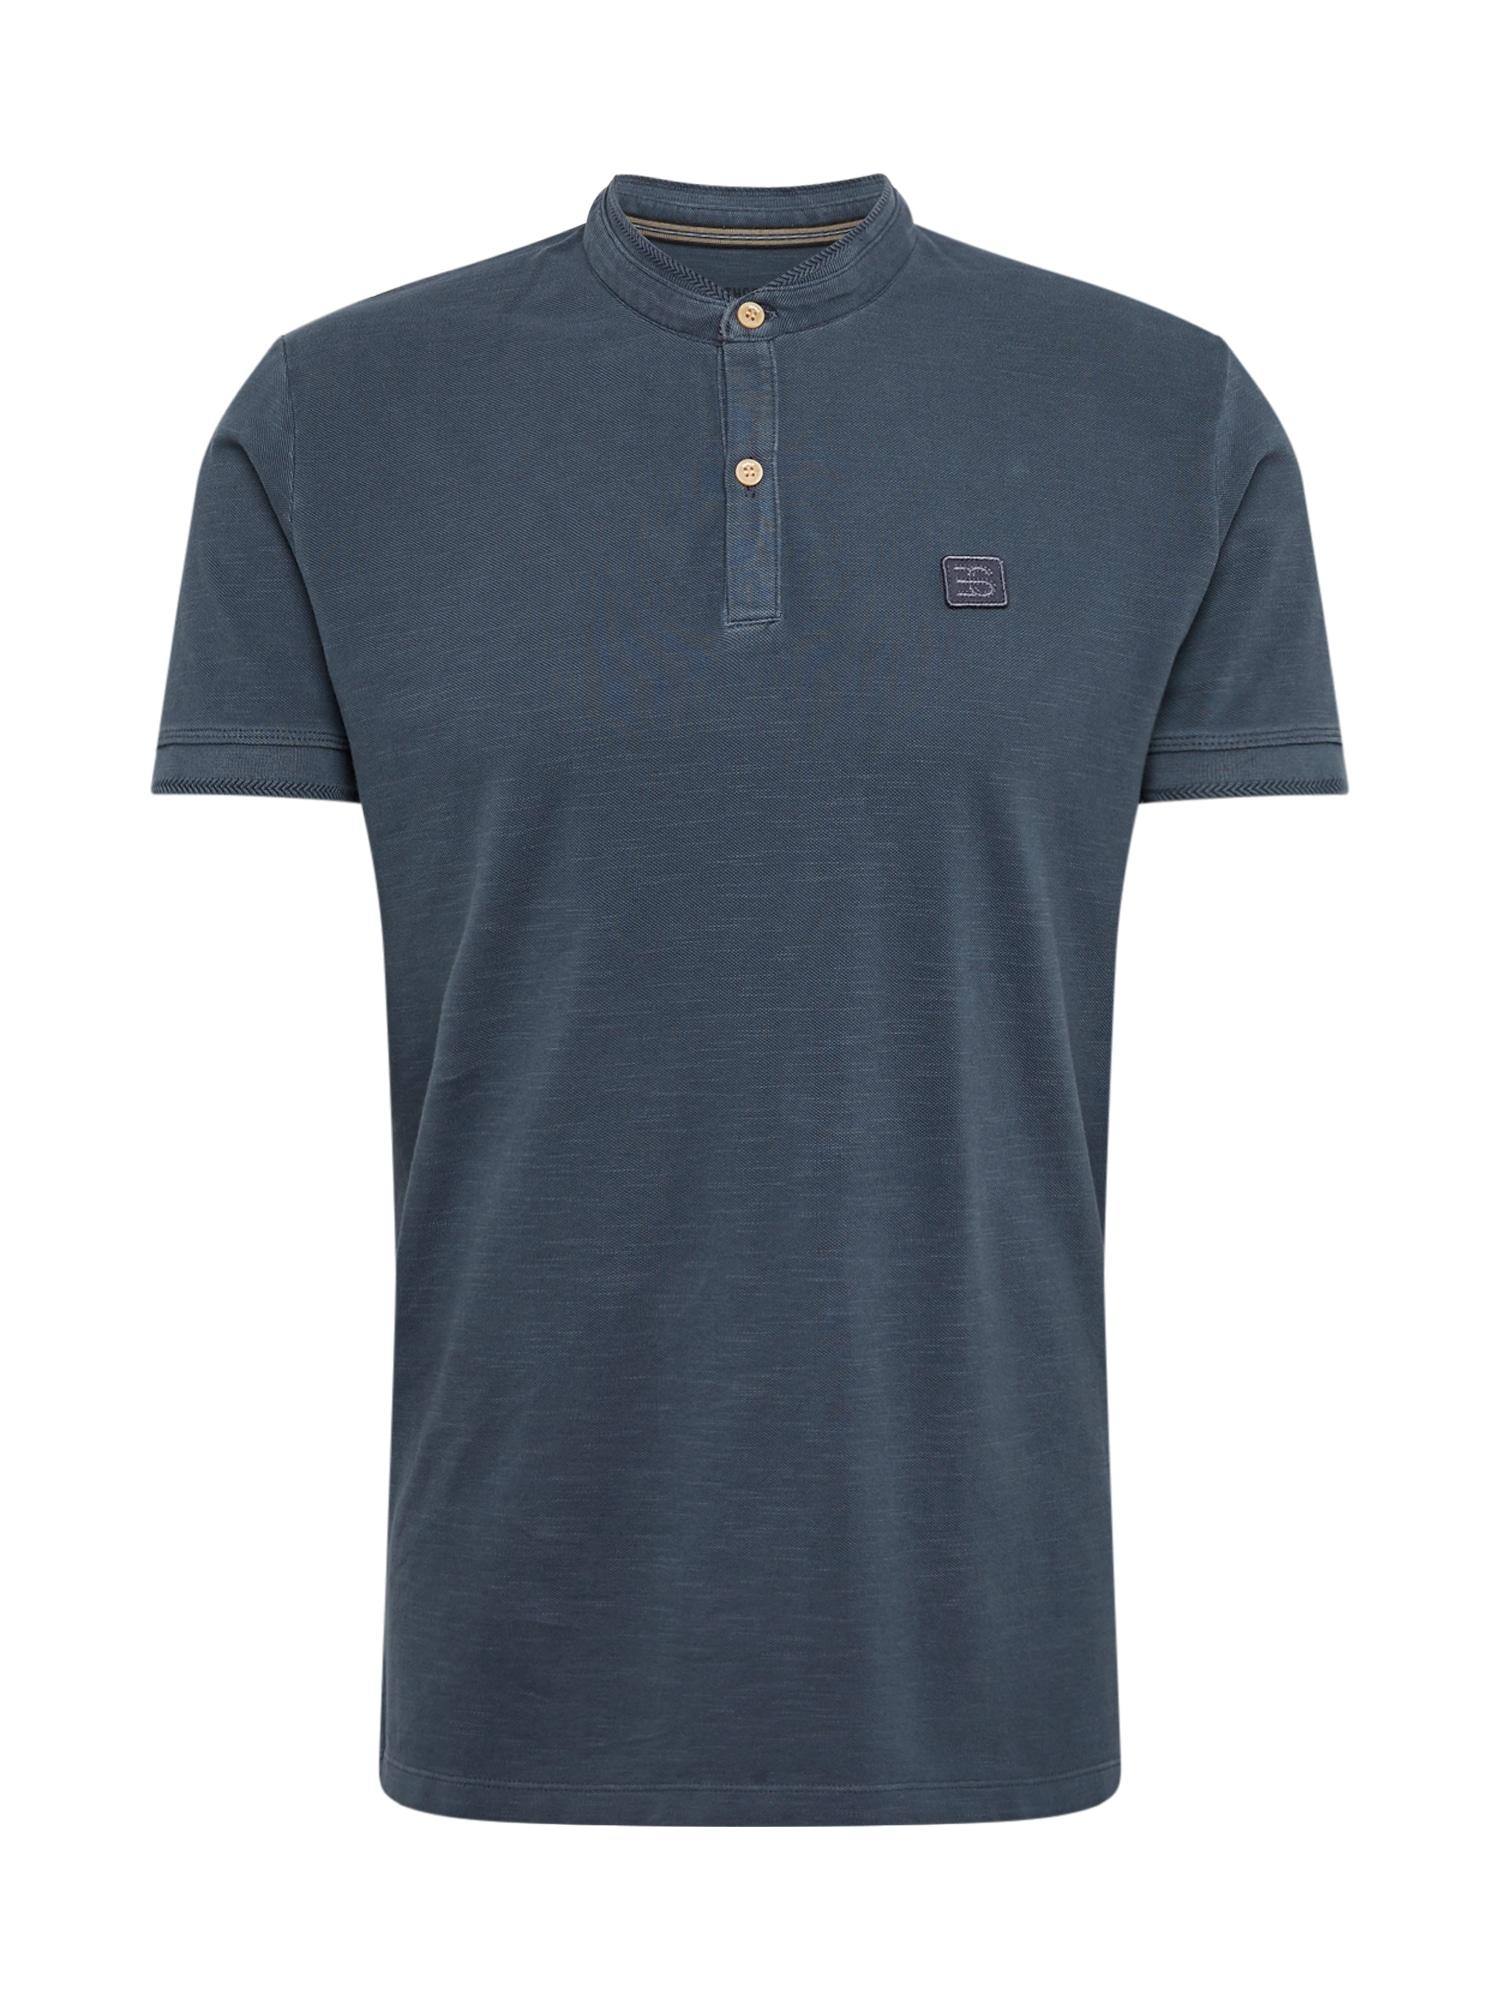 ESPRIT Marškinėliai 'OCS ARCH dye po' tamsiai mėlyna